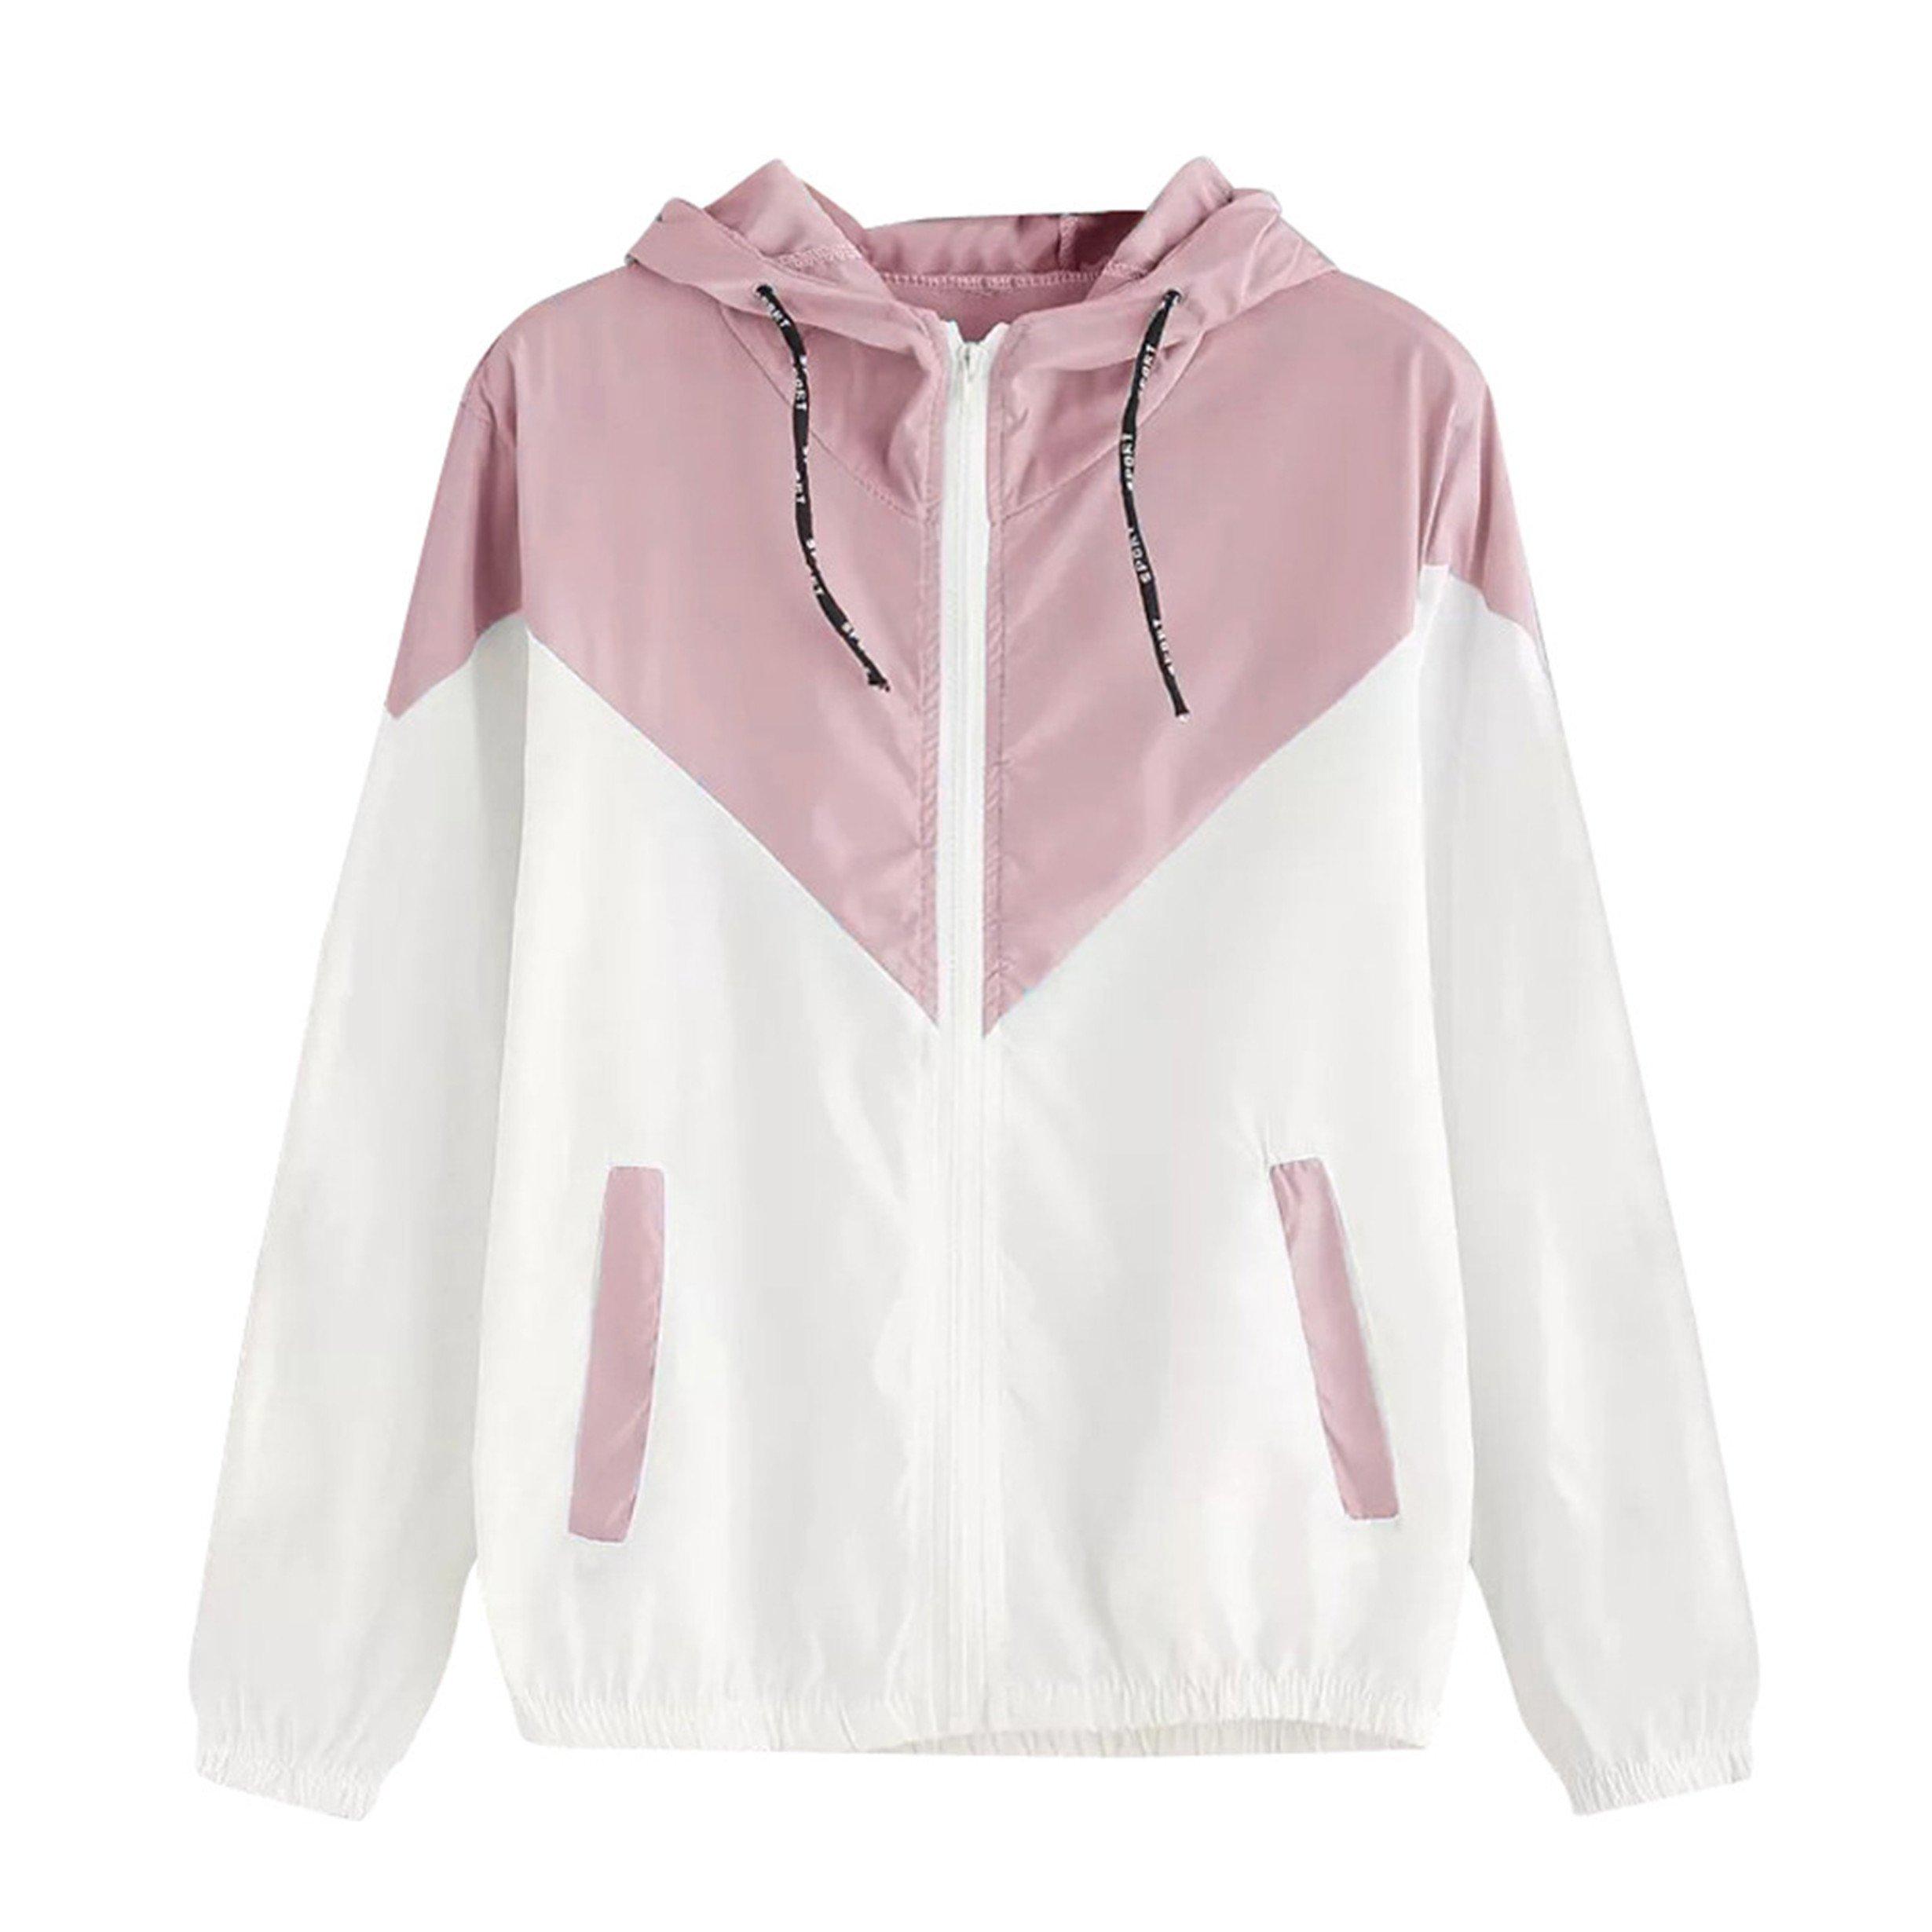 Londony Women's Plus Size Color Block Drawstring Active Outdoor Hooded Lightweight Rain Jacket Windbreaker